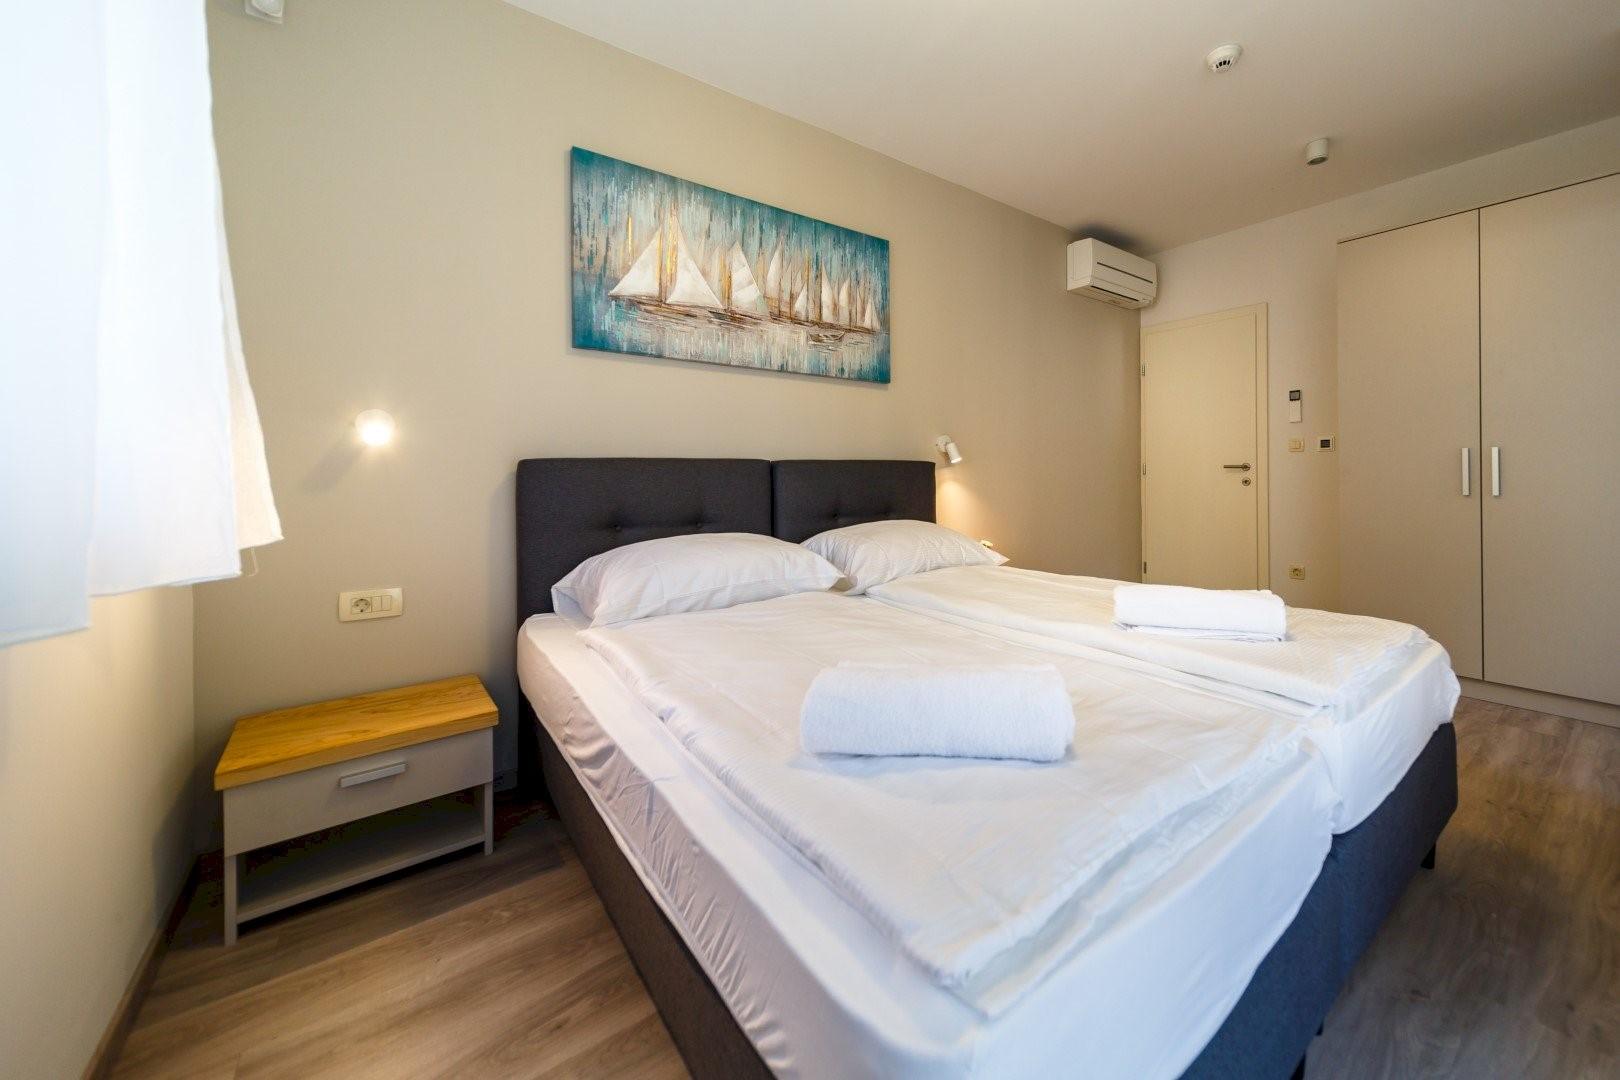 Ferienhaus Luxury Villa Loma 1 (2586644), Sveti Vid-Miholjice, Insel Krk, Kvarner, Kroatien, Bild 11